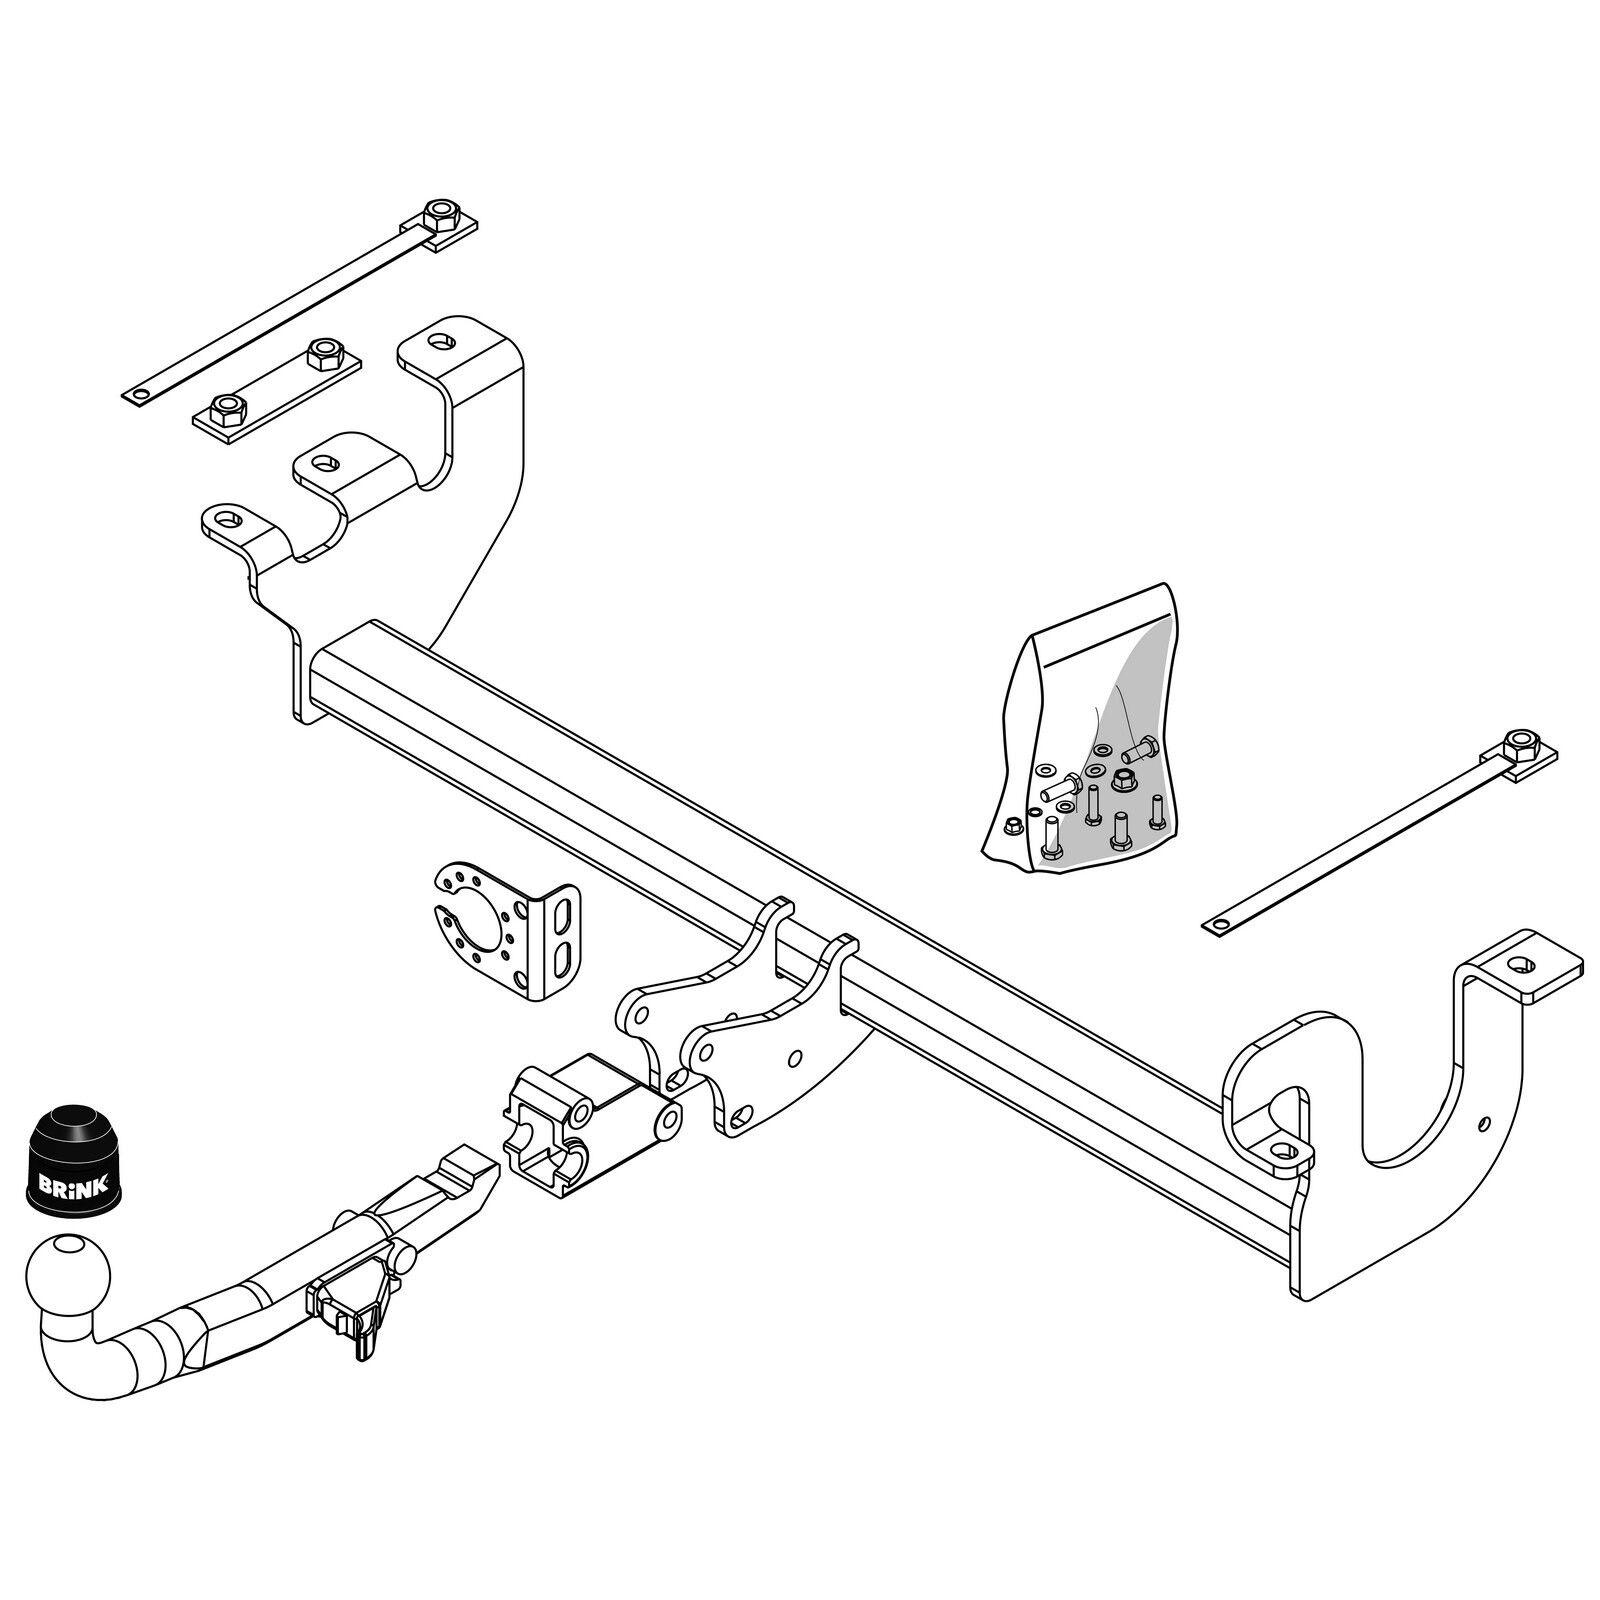 brink towbar for suzuki jimny 1998-2018 - detachable tow bar | ebay  ebay